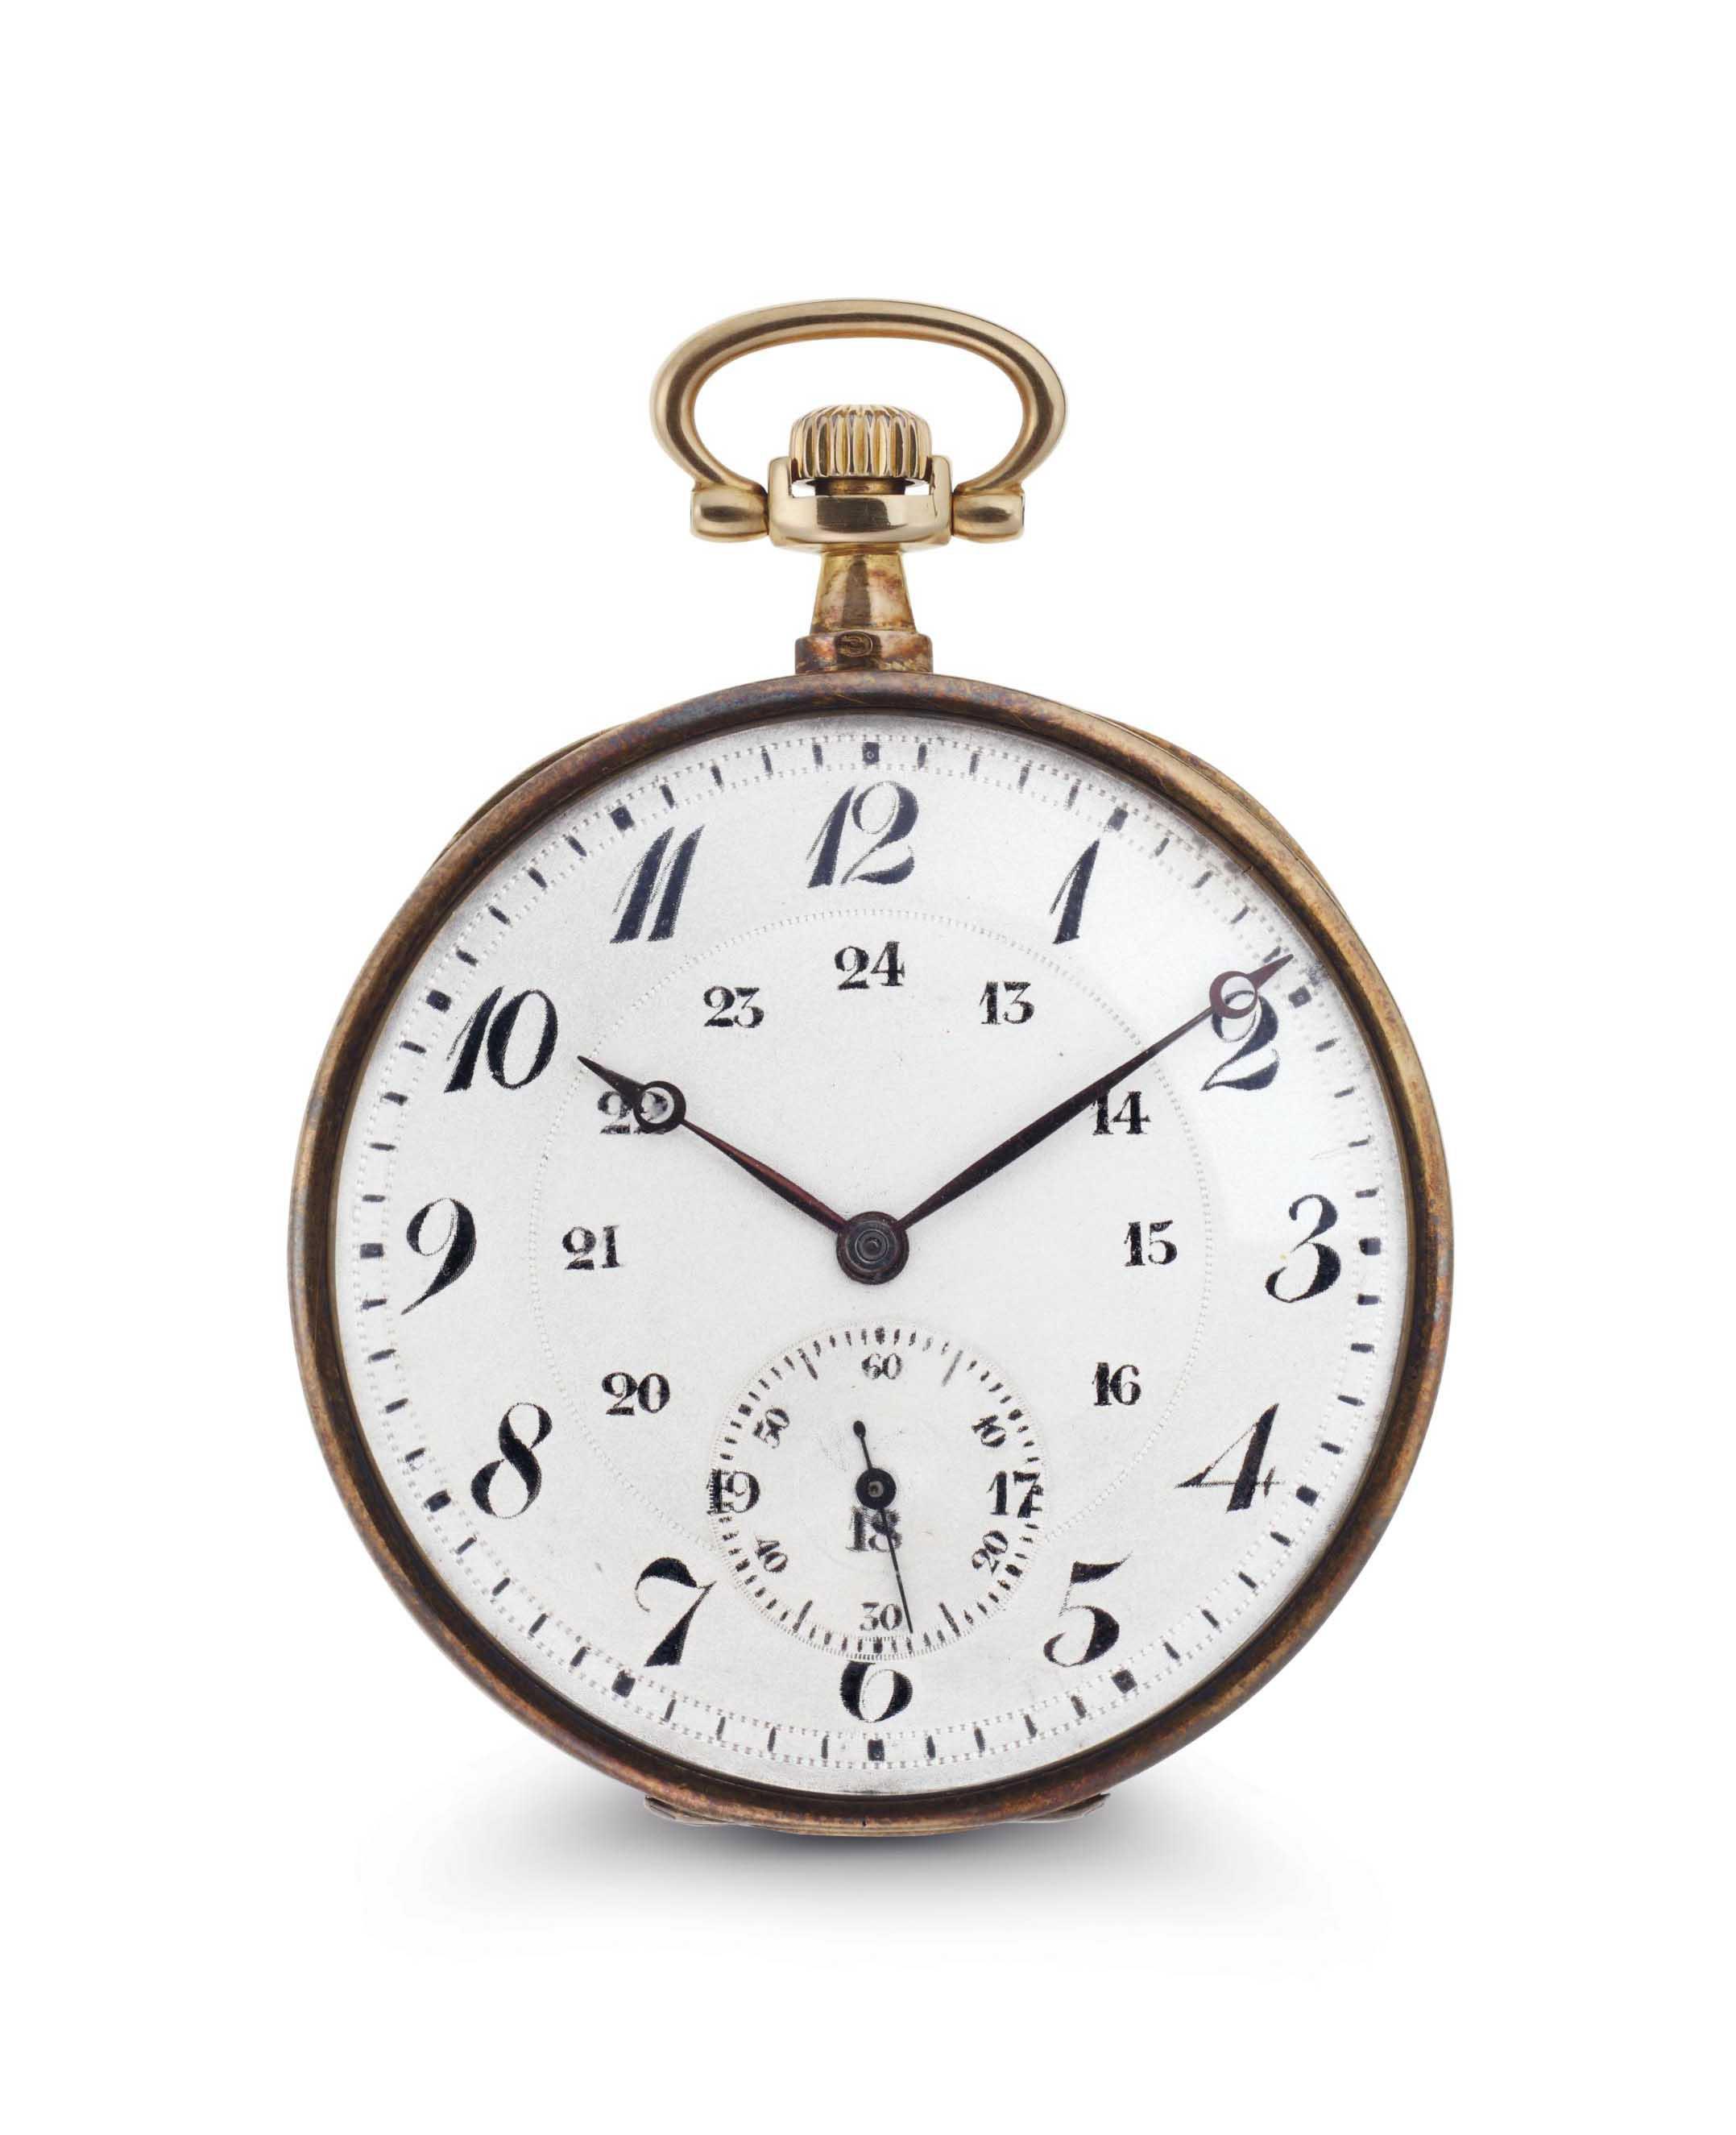 LaCloche Freres. An 18k Gold Openface Keyless Lever Dress Watch